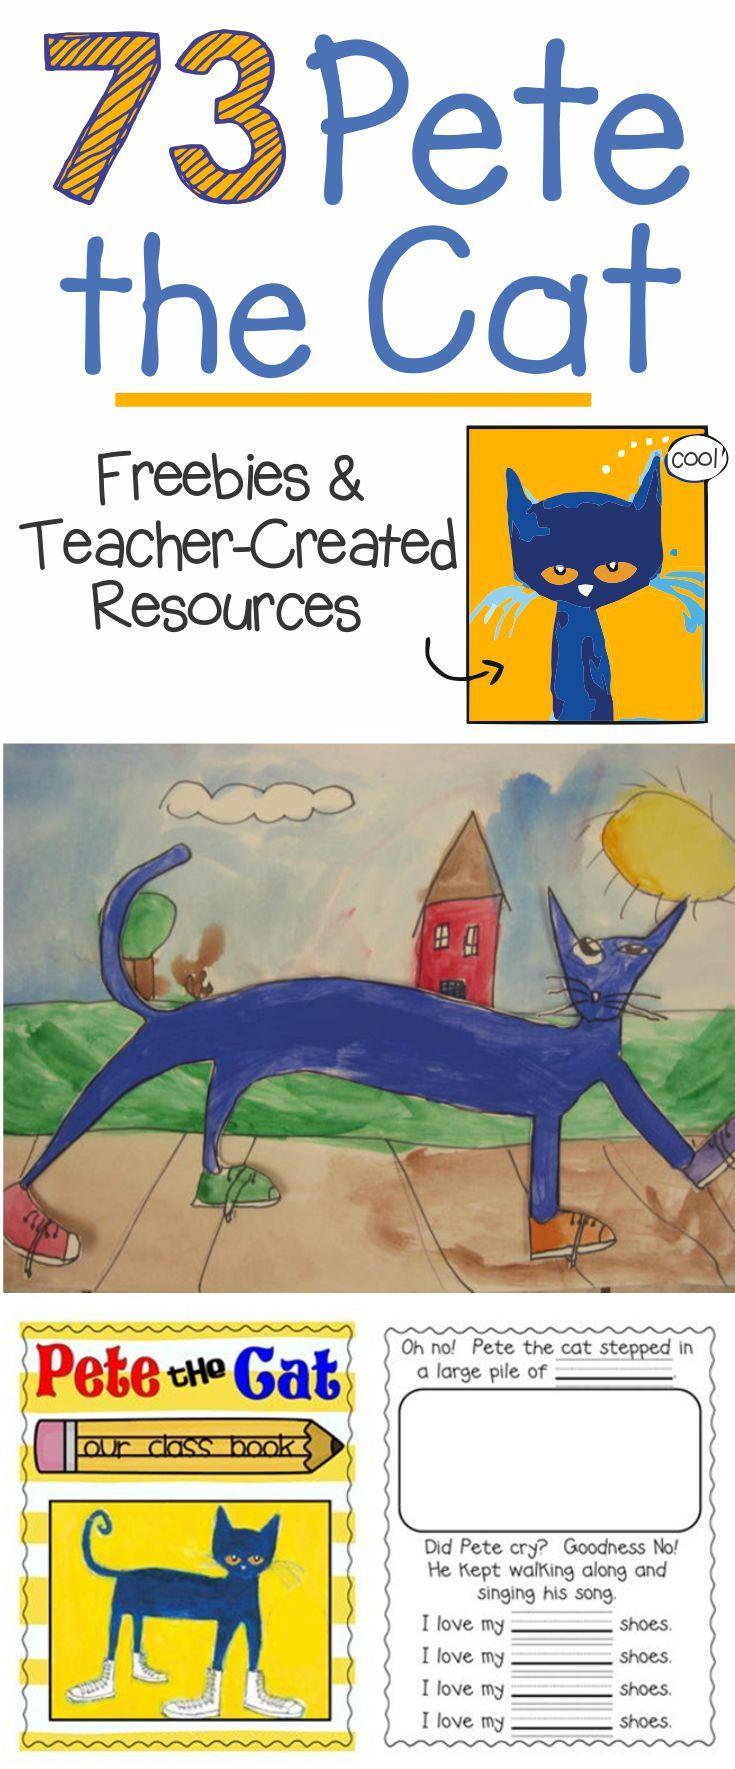 Worksheet Kindergarten Enrichment Ideas 1000 ideas about kindergarten reading activities on pinterest and letter p activities